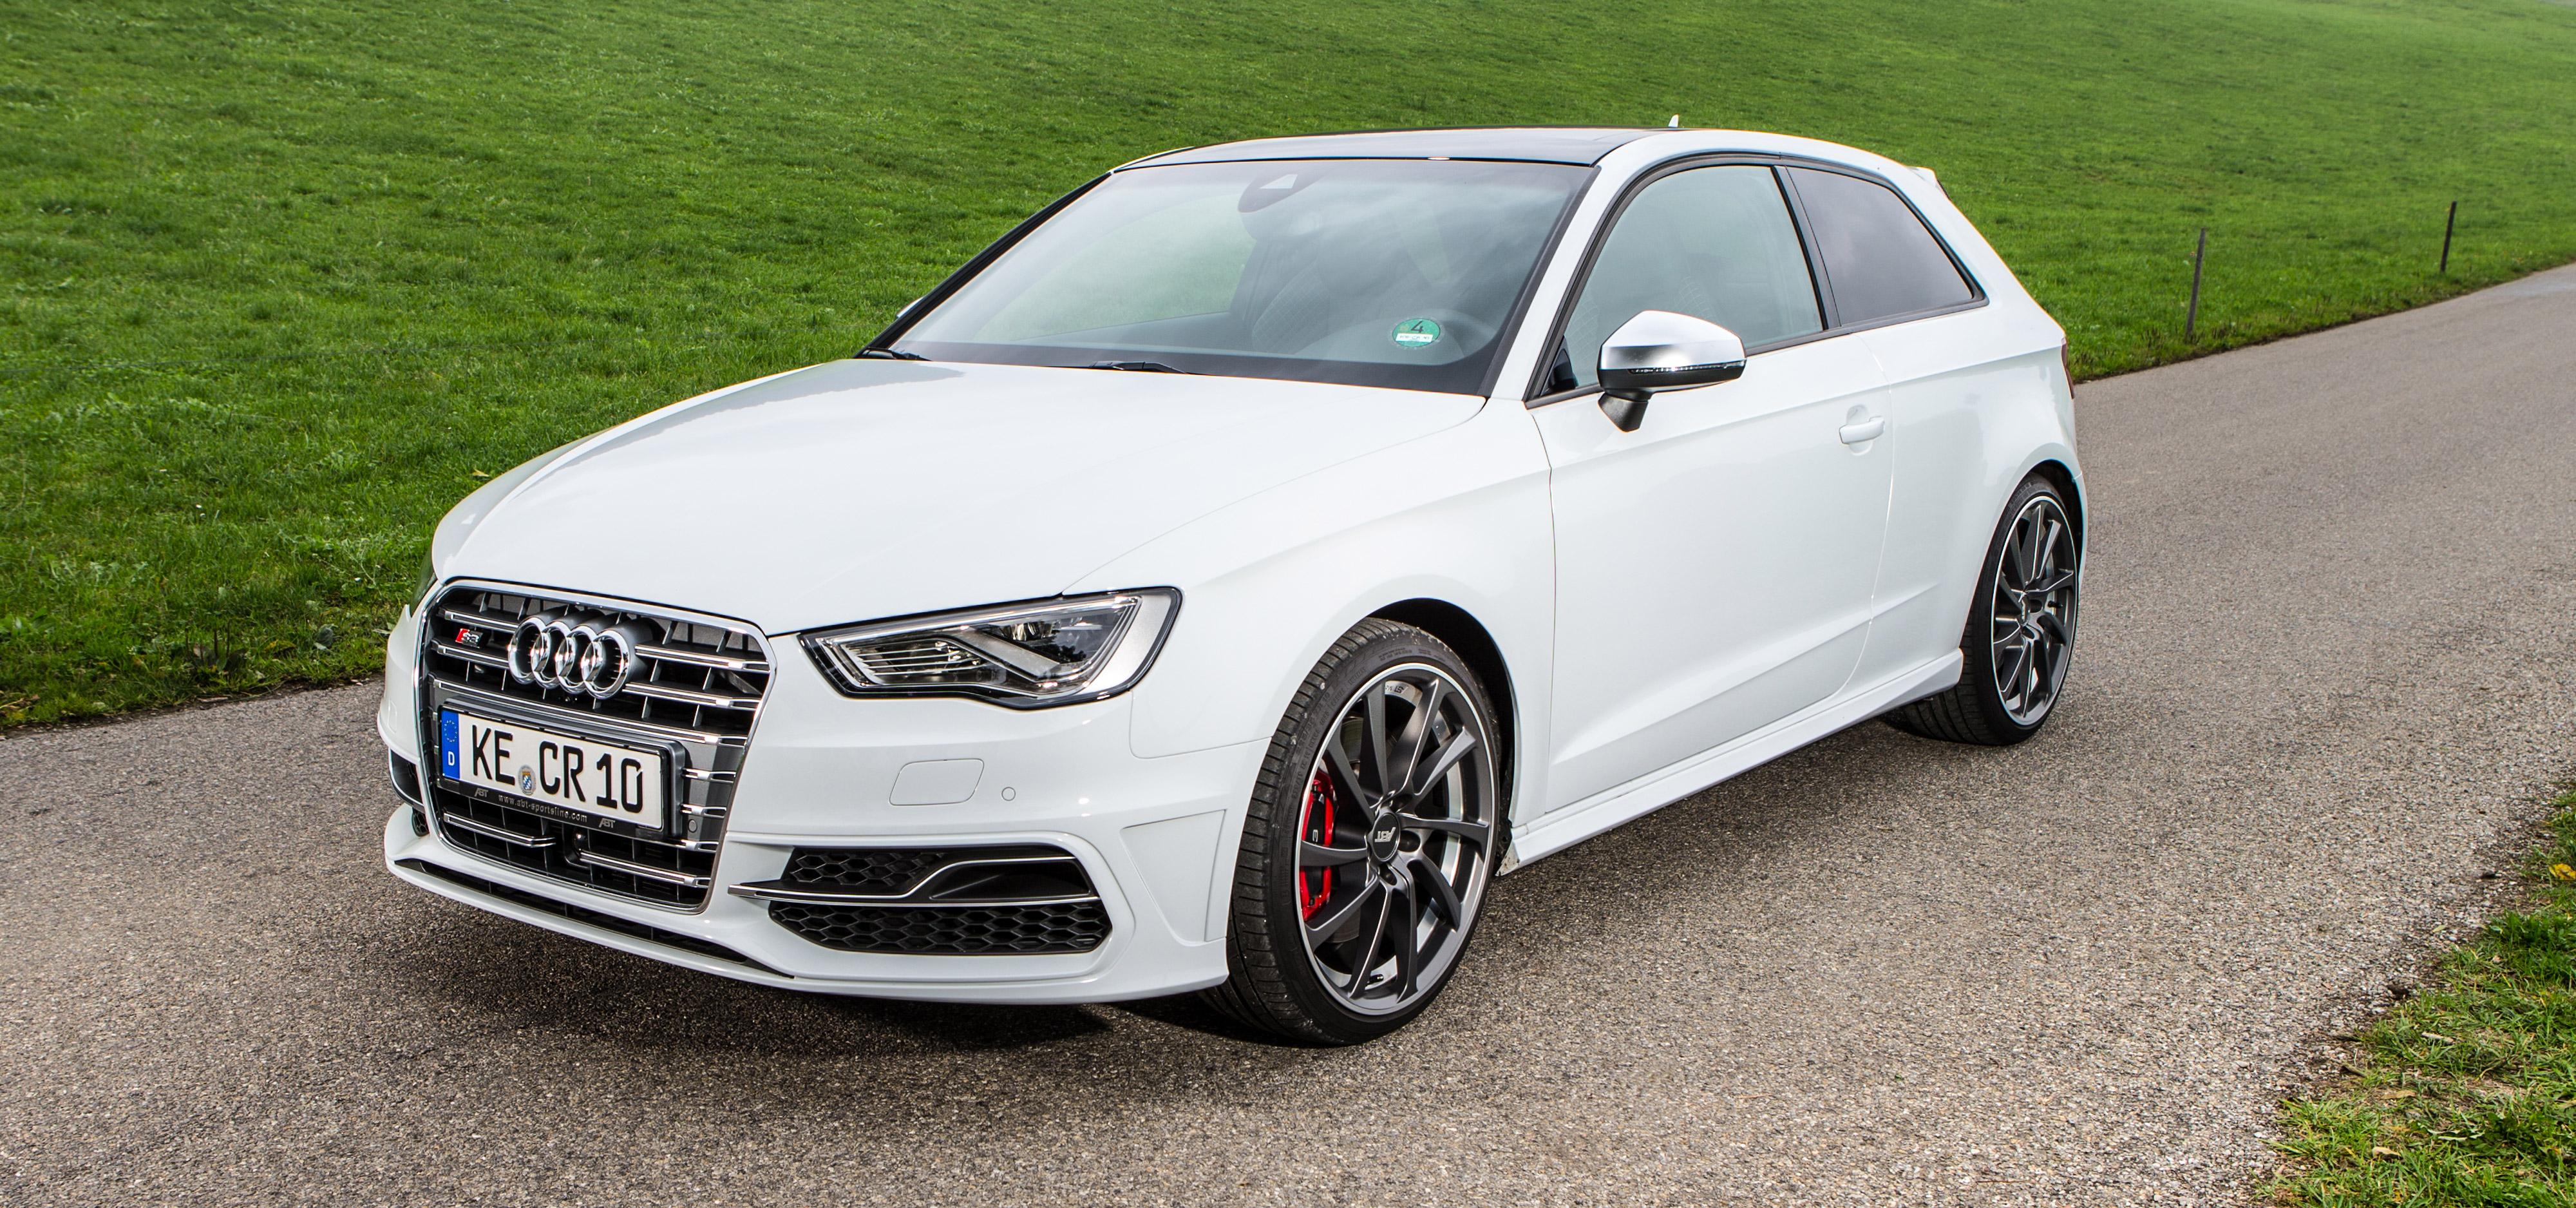 Audi S ABT Sportsline - S3 audi